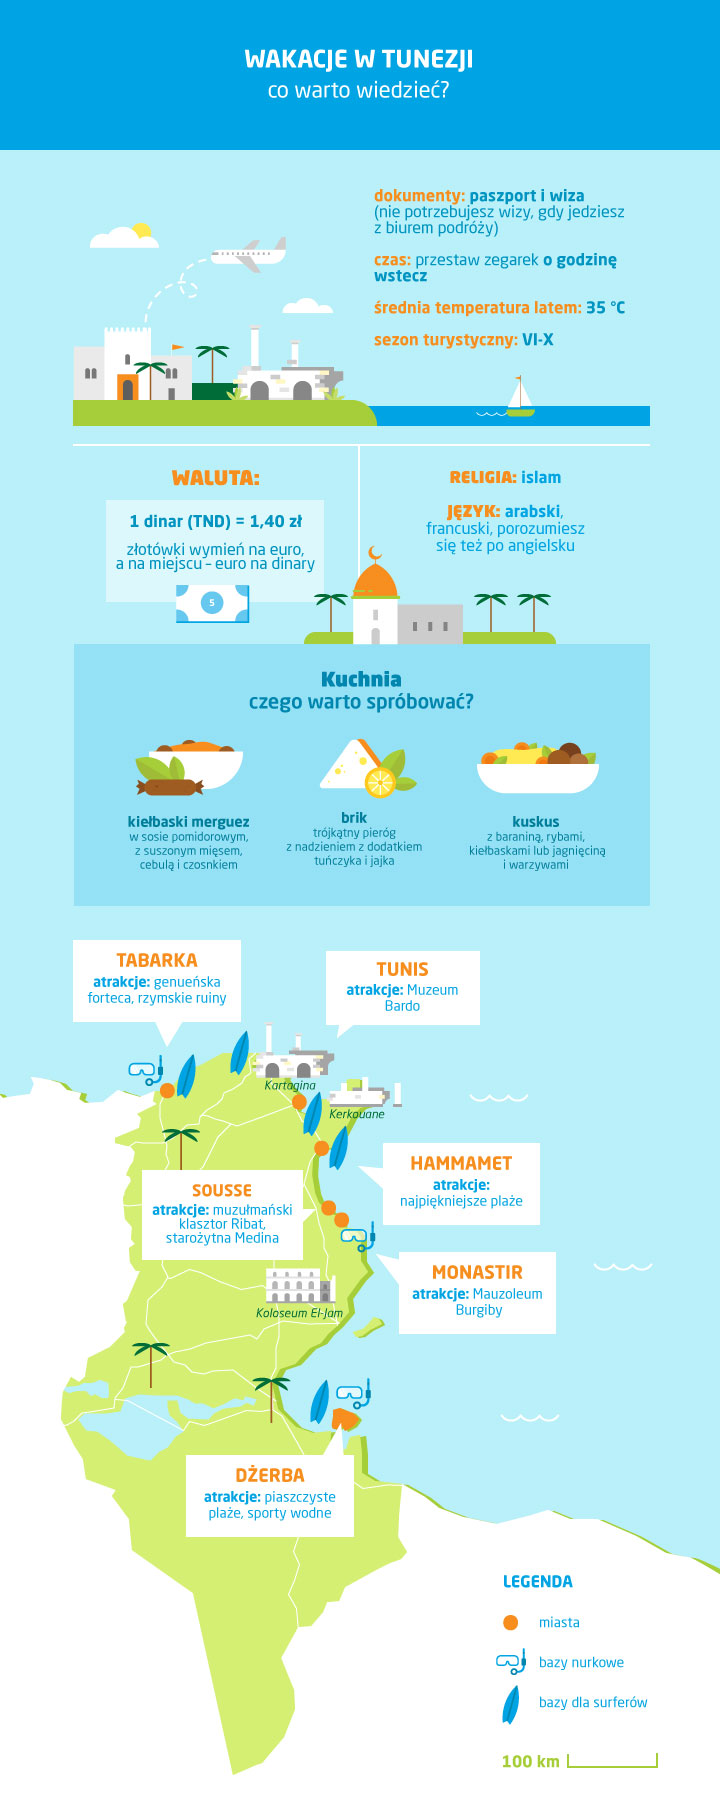 Tunezja - waluta, religia, język - infografika